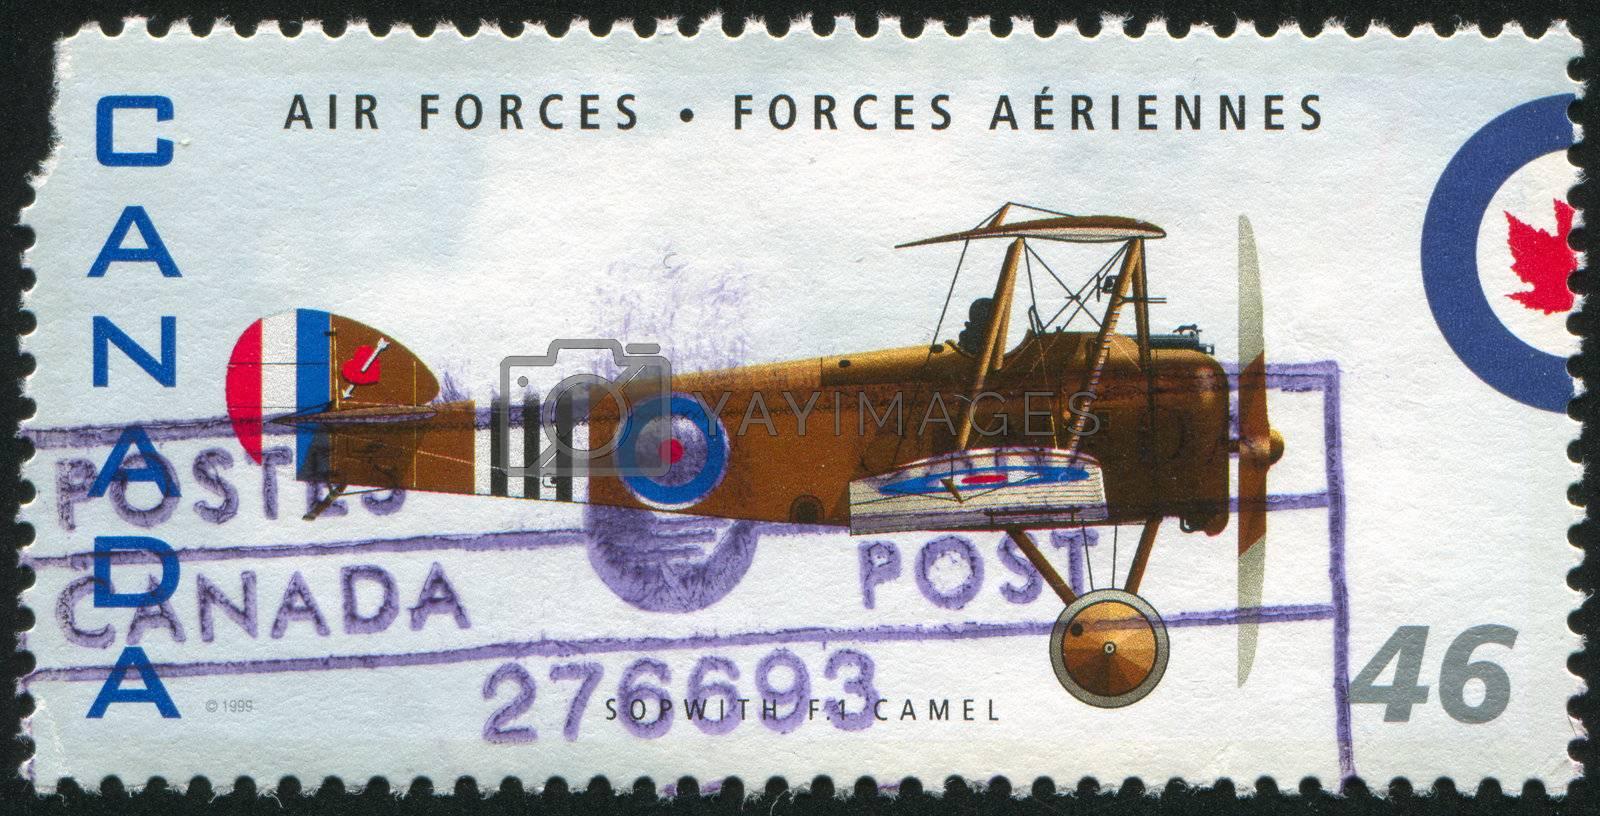 CANADA - CIRCA 1999: stamp printed by Canada, shows aeroplane, Sopwith F1 Camel, circa 1999